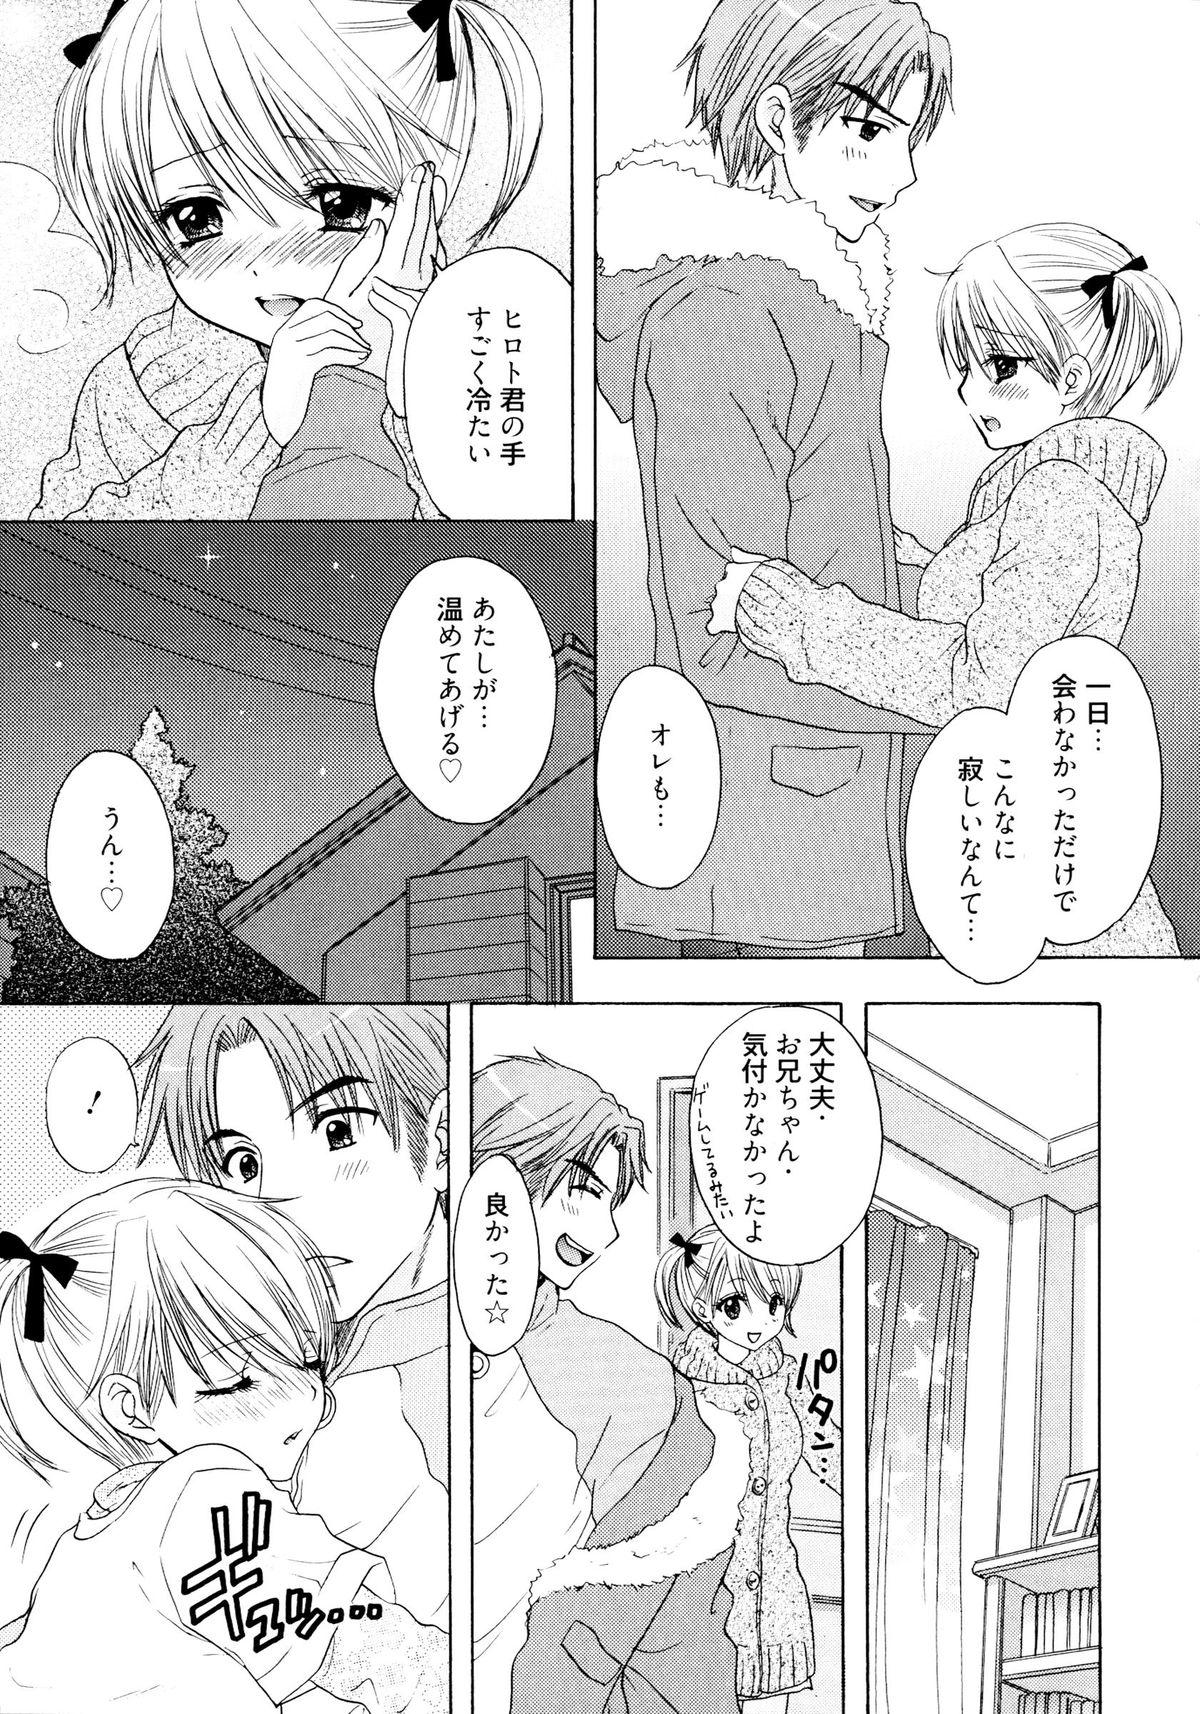 The Great Escape 4 Shokai Genteiban 96